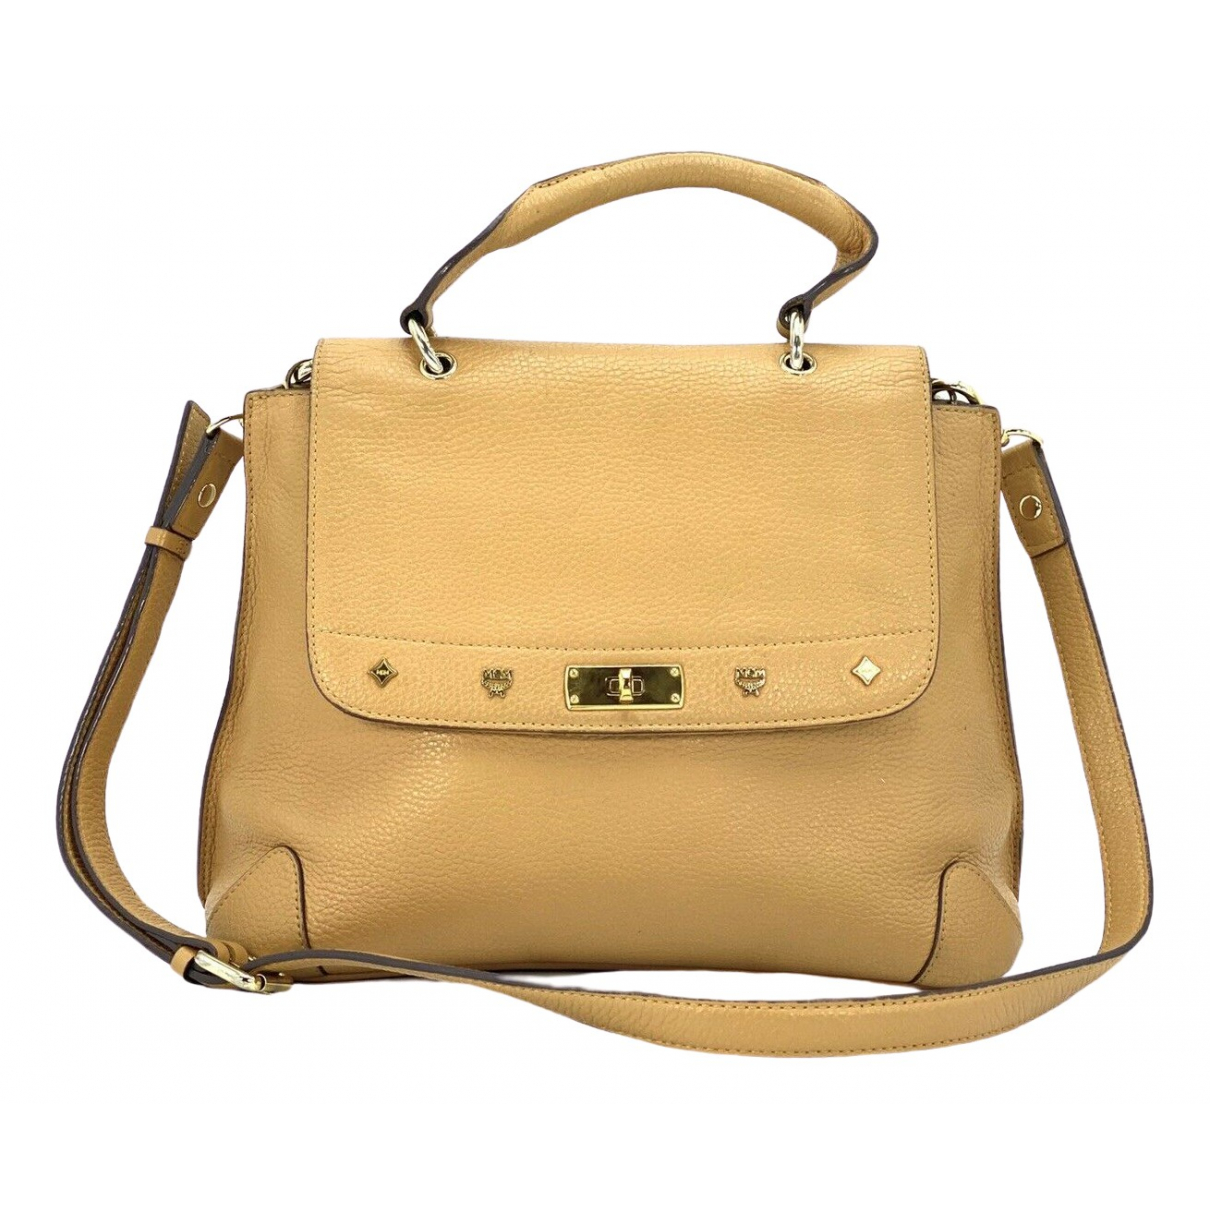 Mcm \N Yellow Leather handbag for Women \N